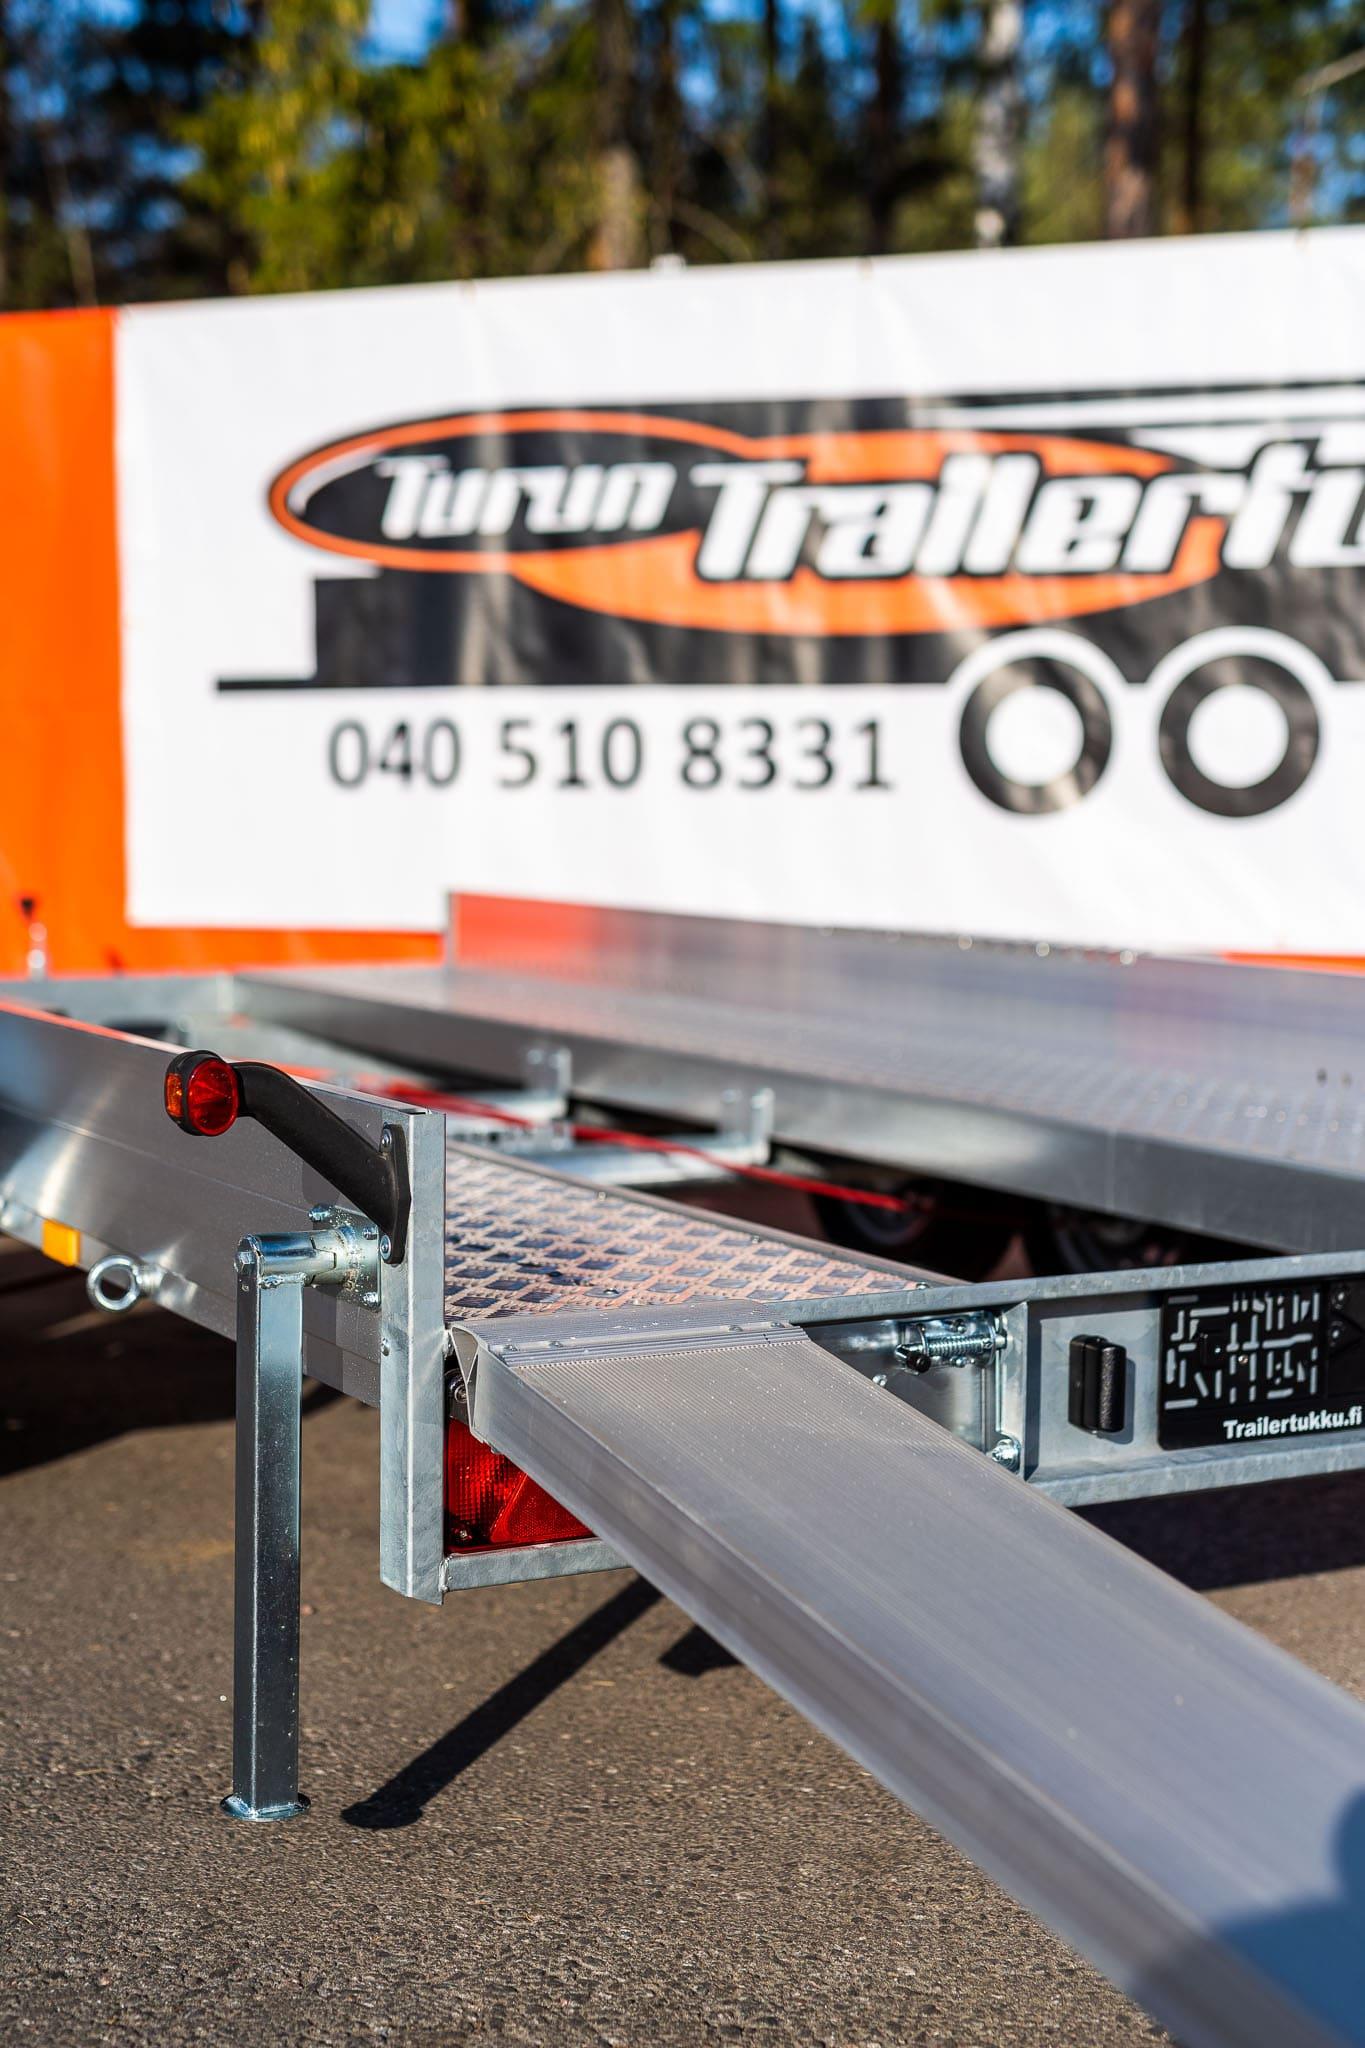 AJORAMPIT alumiini 9800/12500kg (4500x 640mm)